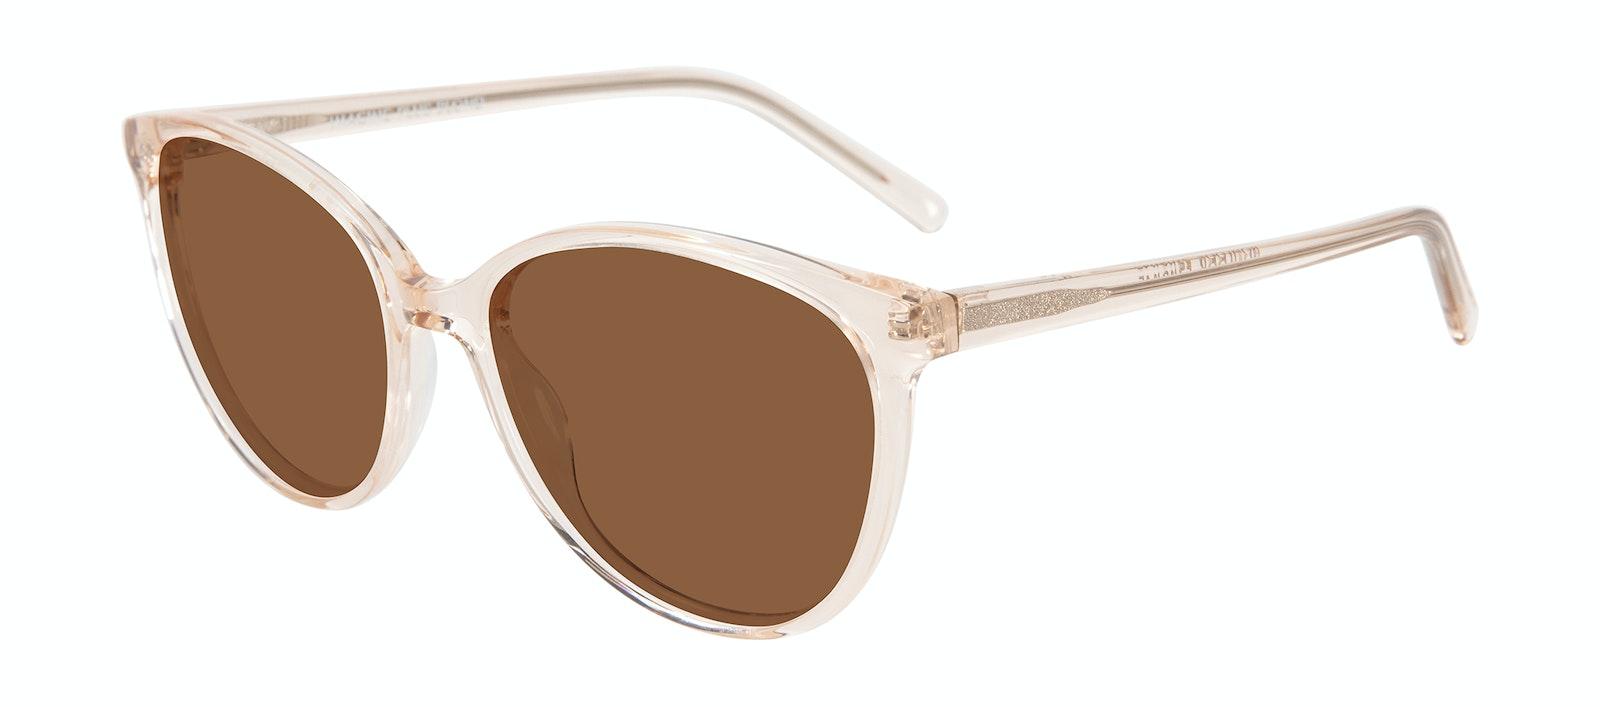 Affordable Fashion Glasses Cat Eye Sunglasses Women Imagine XL Blond Tilt